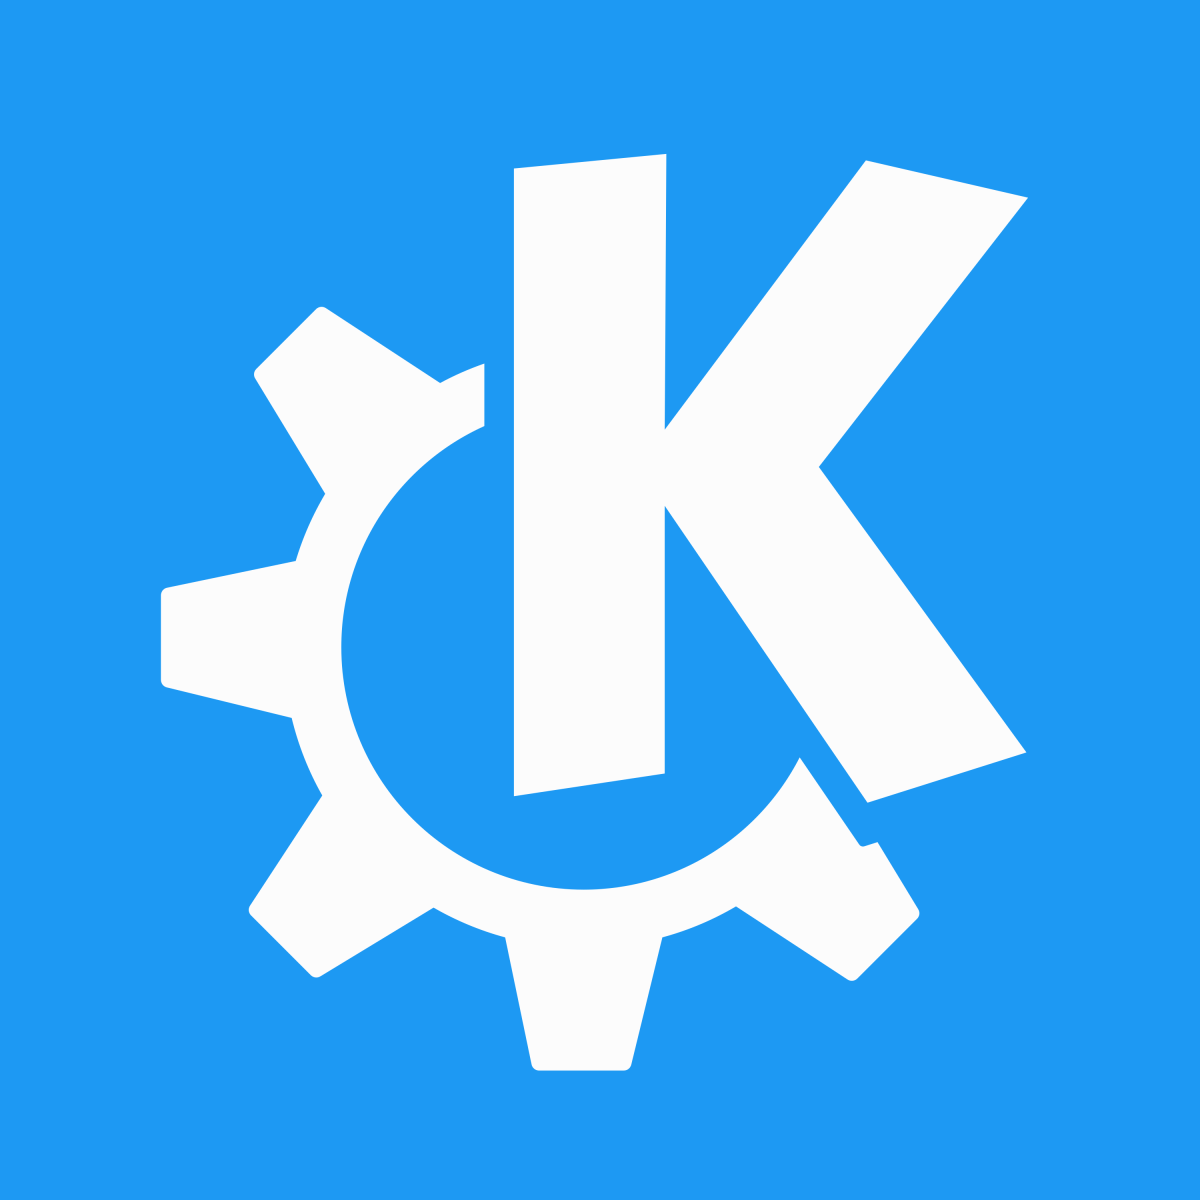 KDE Plasma 5.15.1 ya puede instalarse en Kubuntu 18.10 CosmicCutlefish